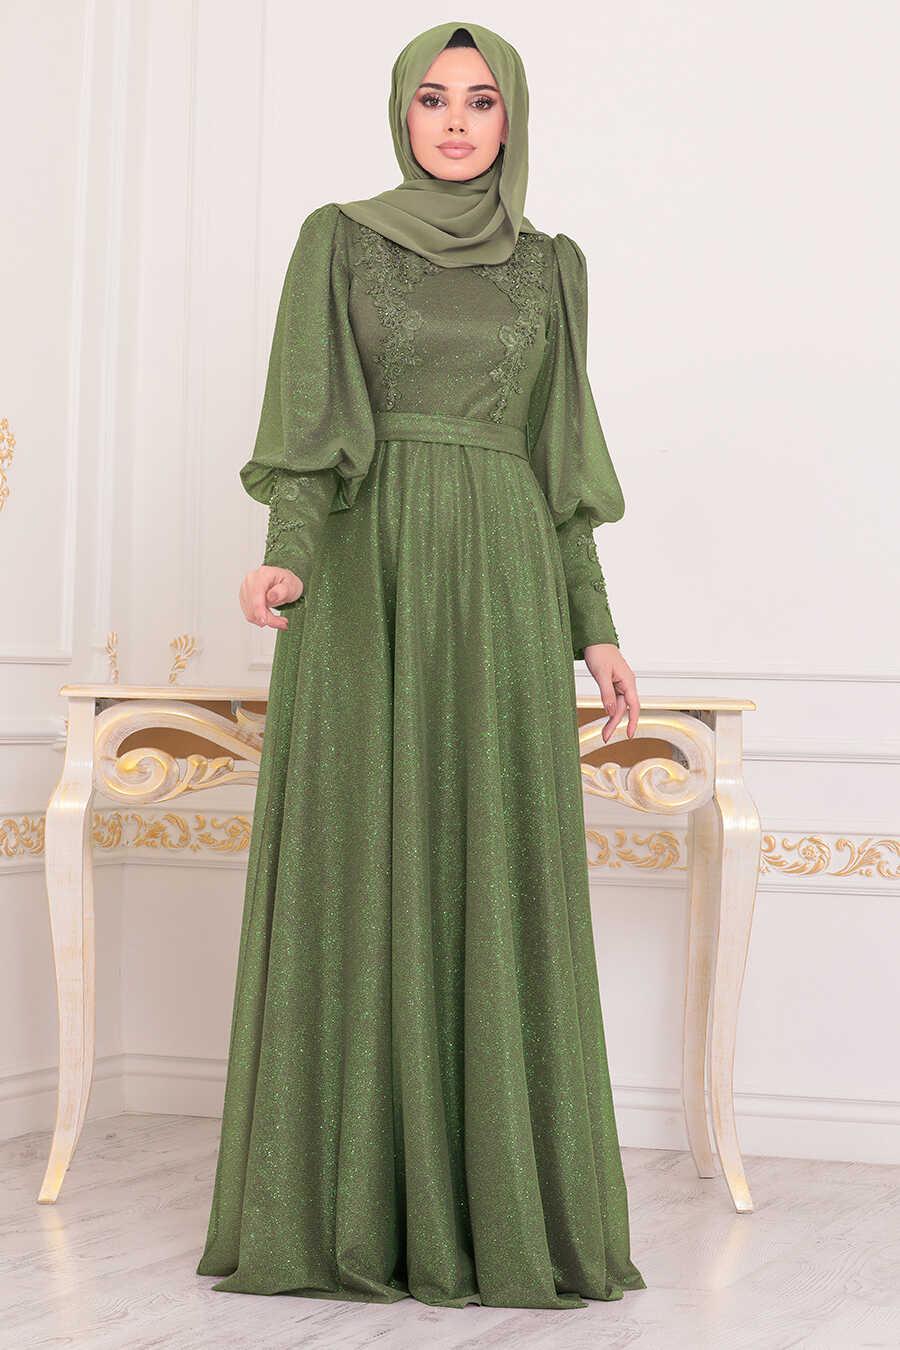 Pistachio Green Hijab Evening Dress 21521FY